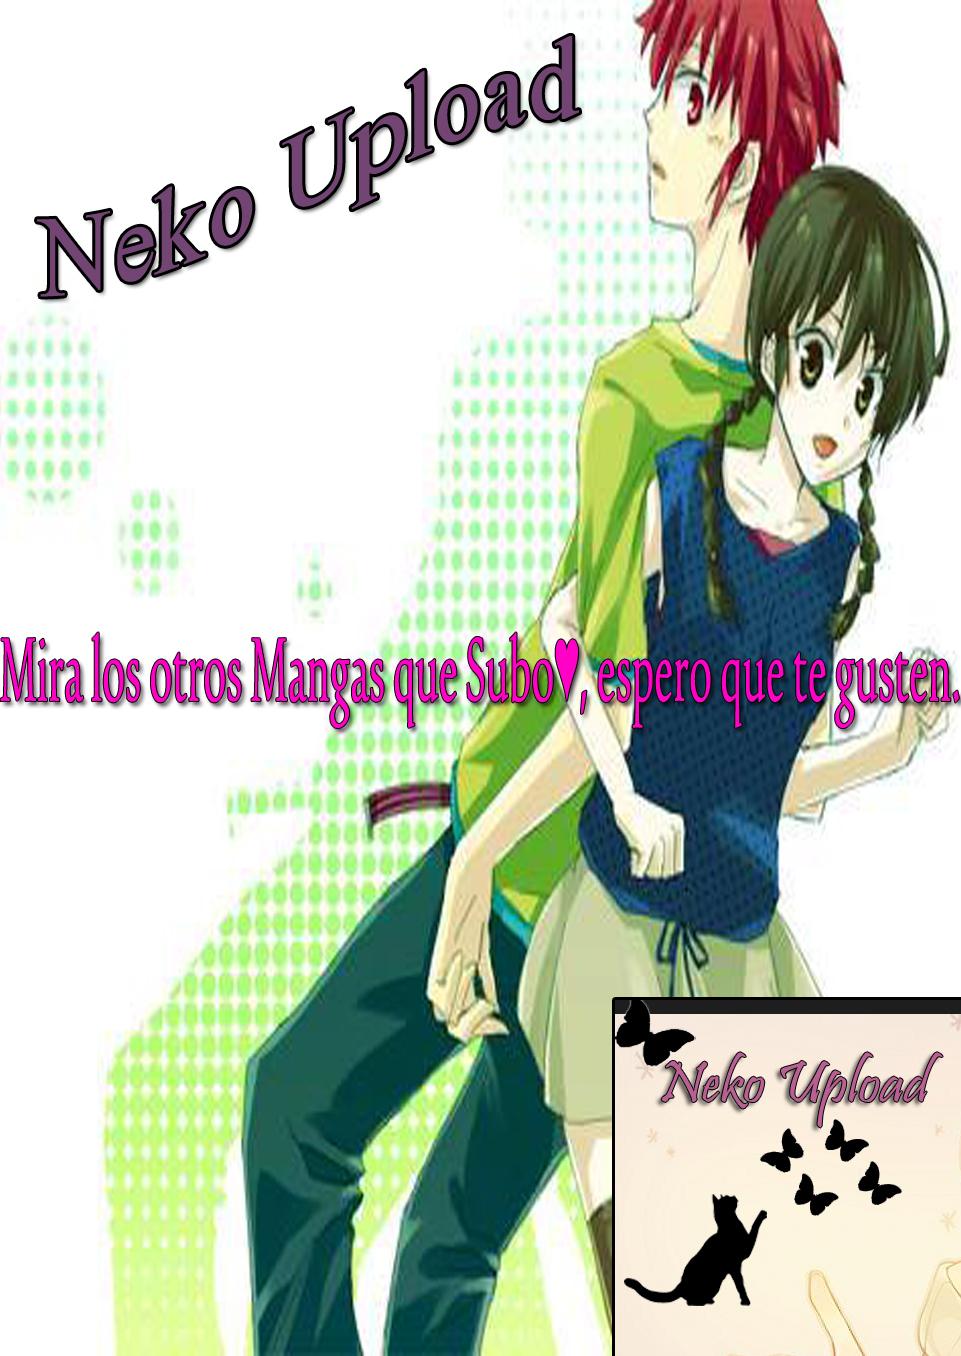 https://c5.ninemanga.com/es_manga/33/609/381573/dd60f94dc138f0c2917b66c31718728e.jpg Page 21